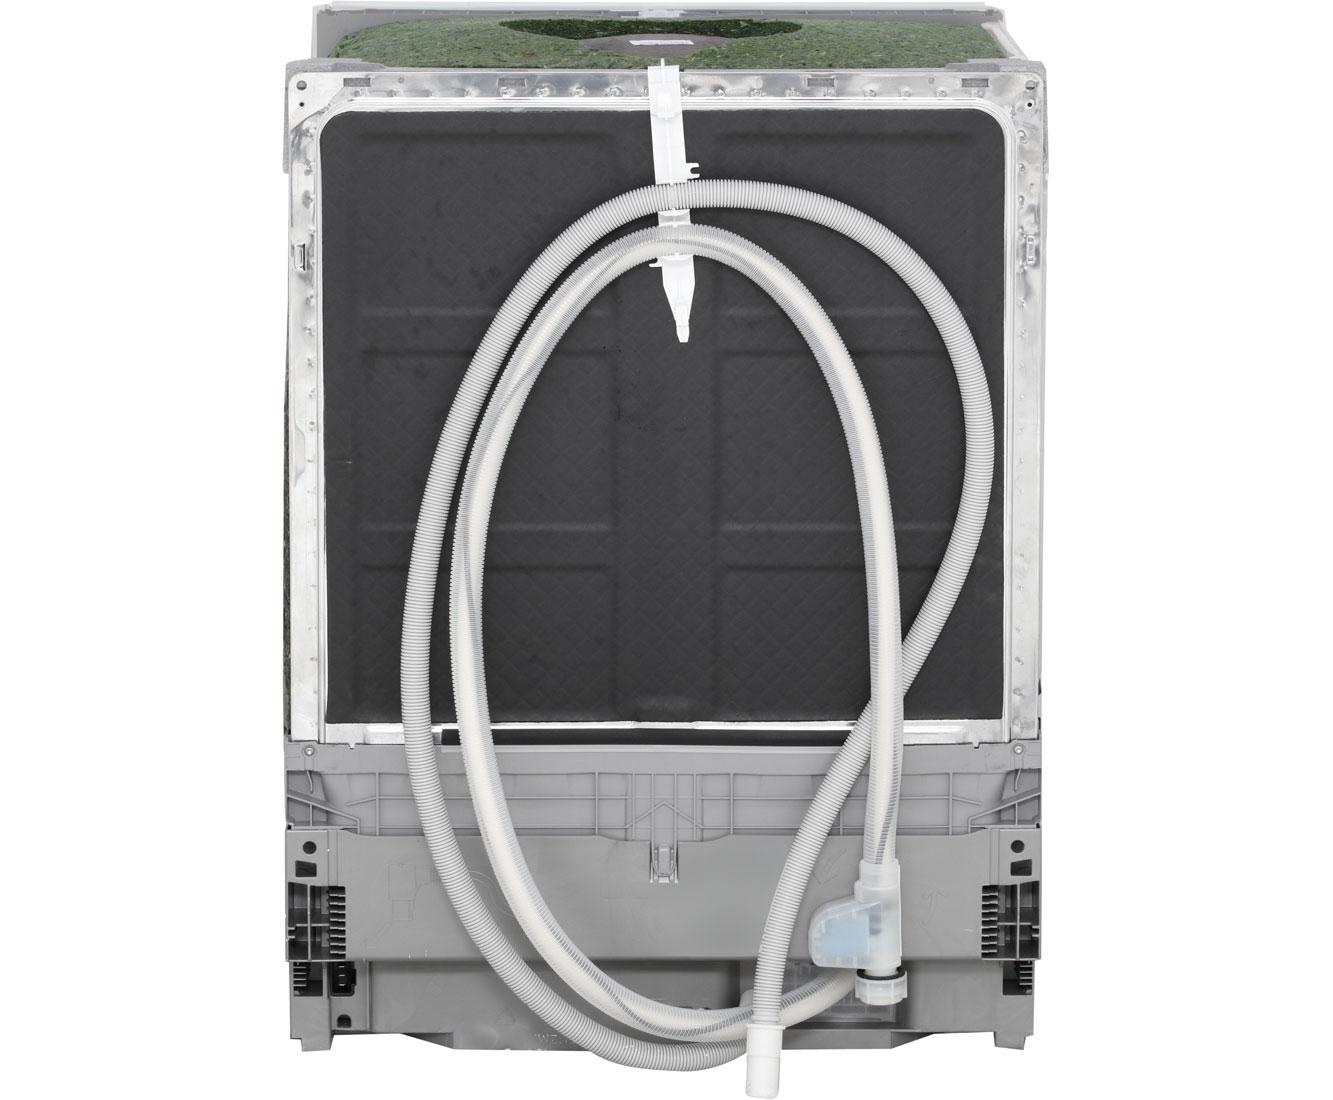 Siemens Iq300 Geschirrspuler Sn436s04ae Unterbau Ao De